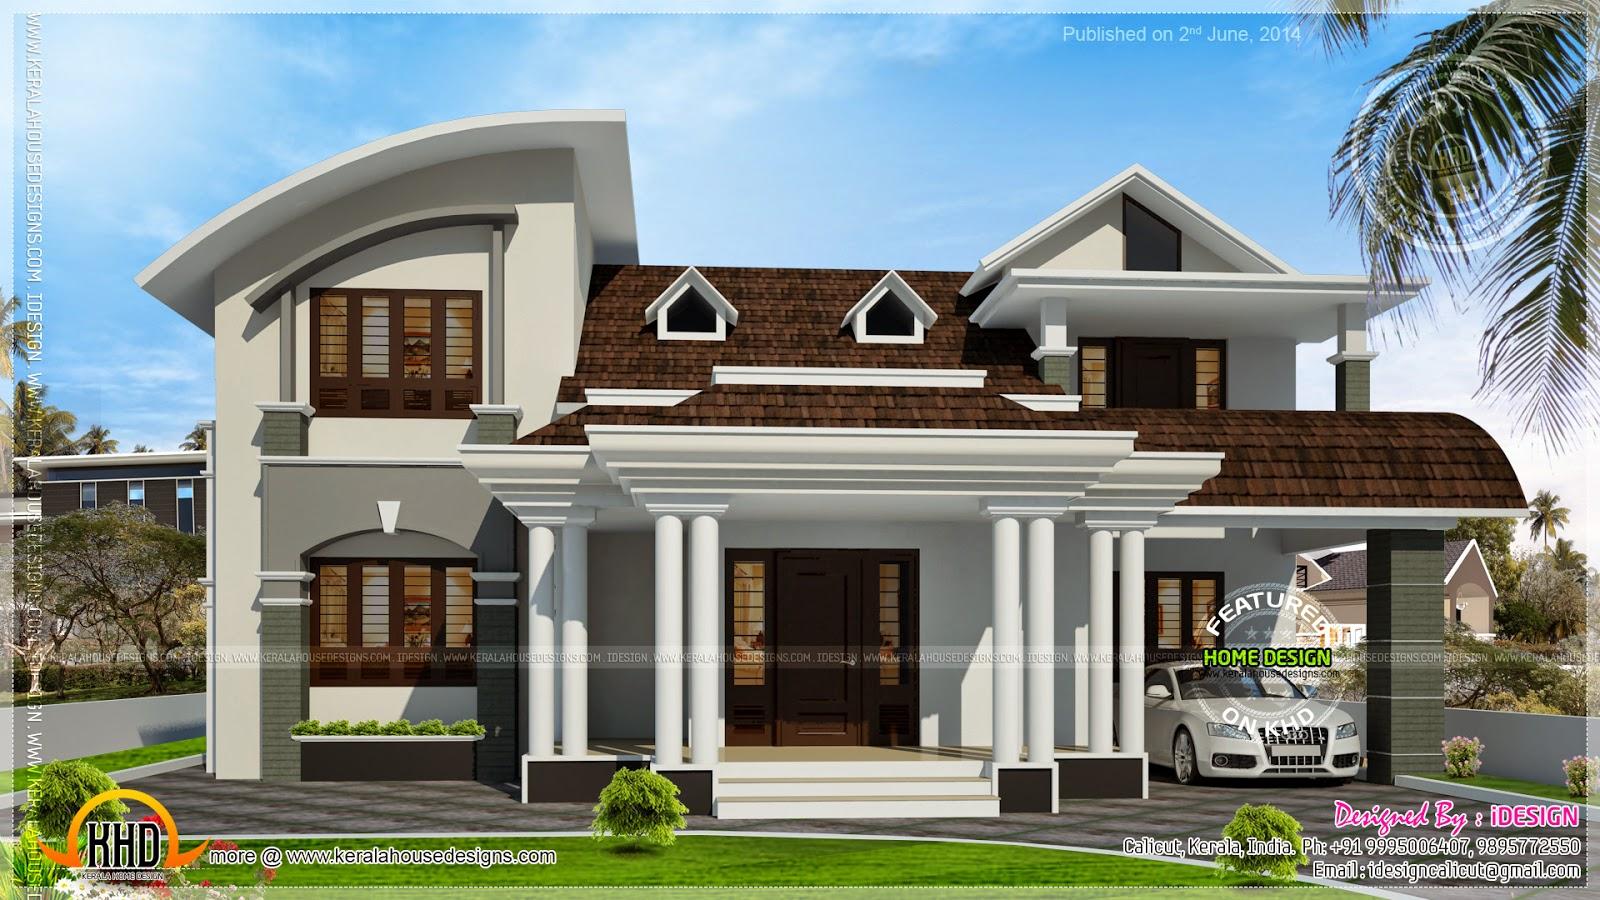 House with beautiful dormer windows - Kerala home design ...